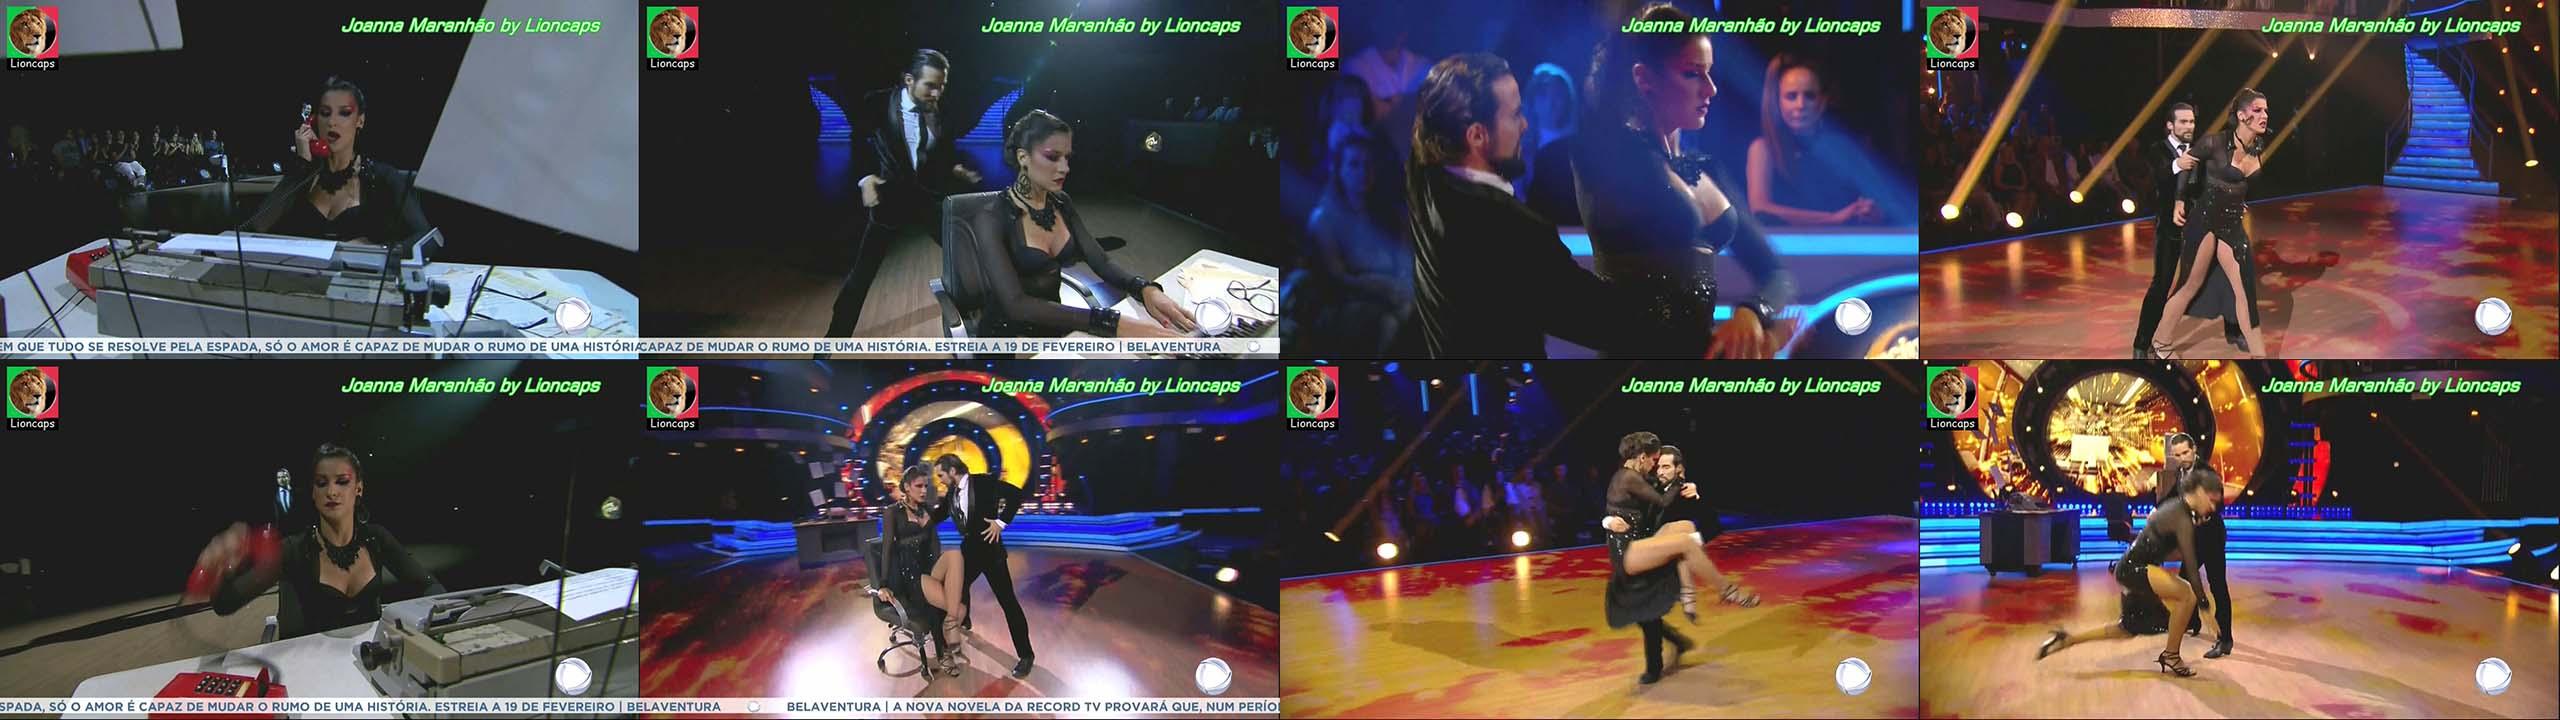 419756978_joanna_maranhao_dancing_1080_lioncaps_13_02_2018_08_122_1037lo.jpg